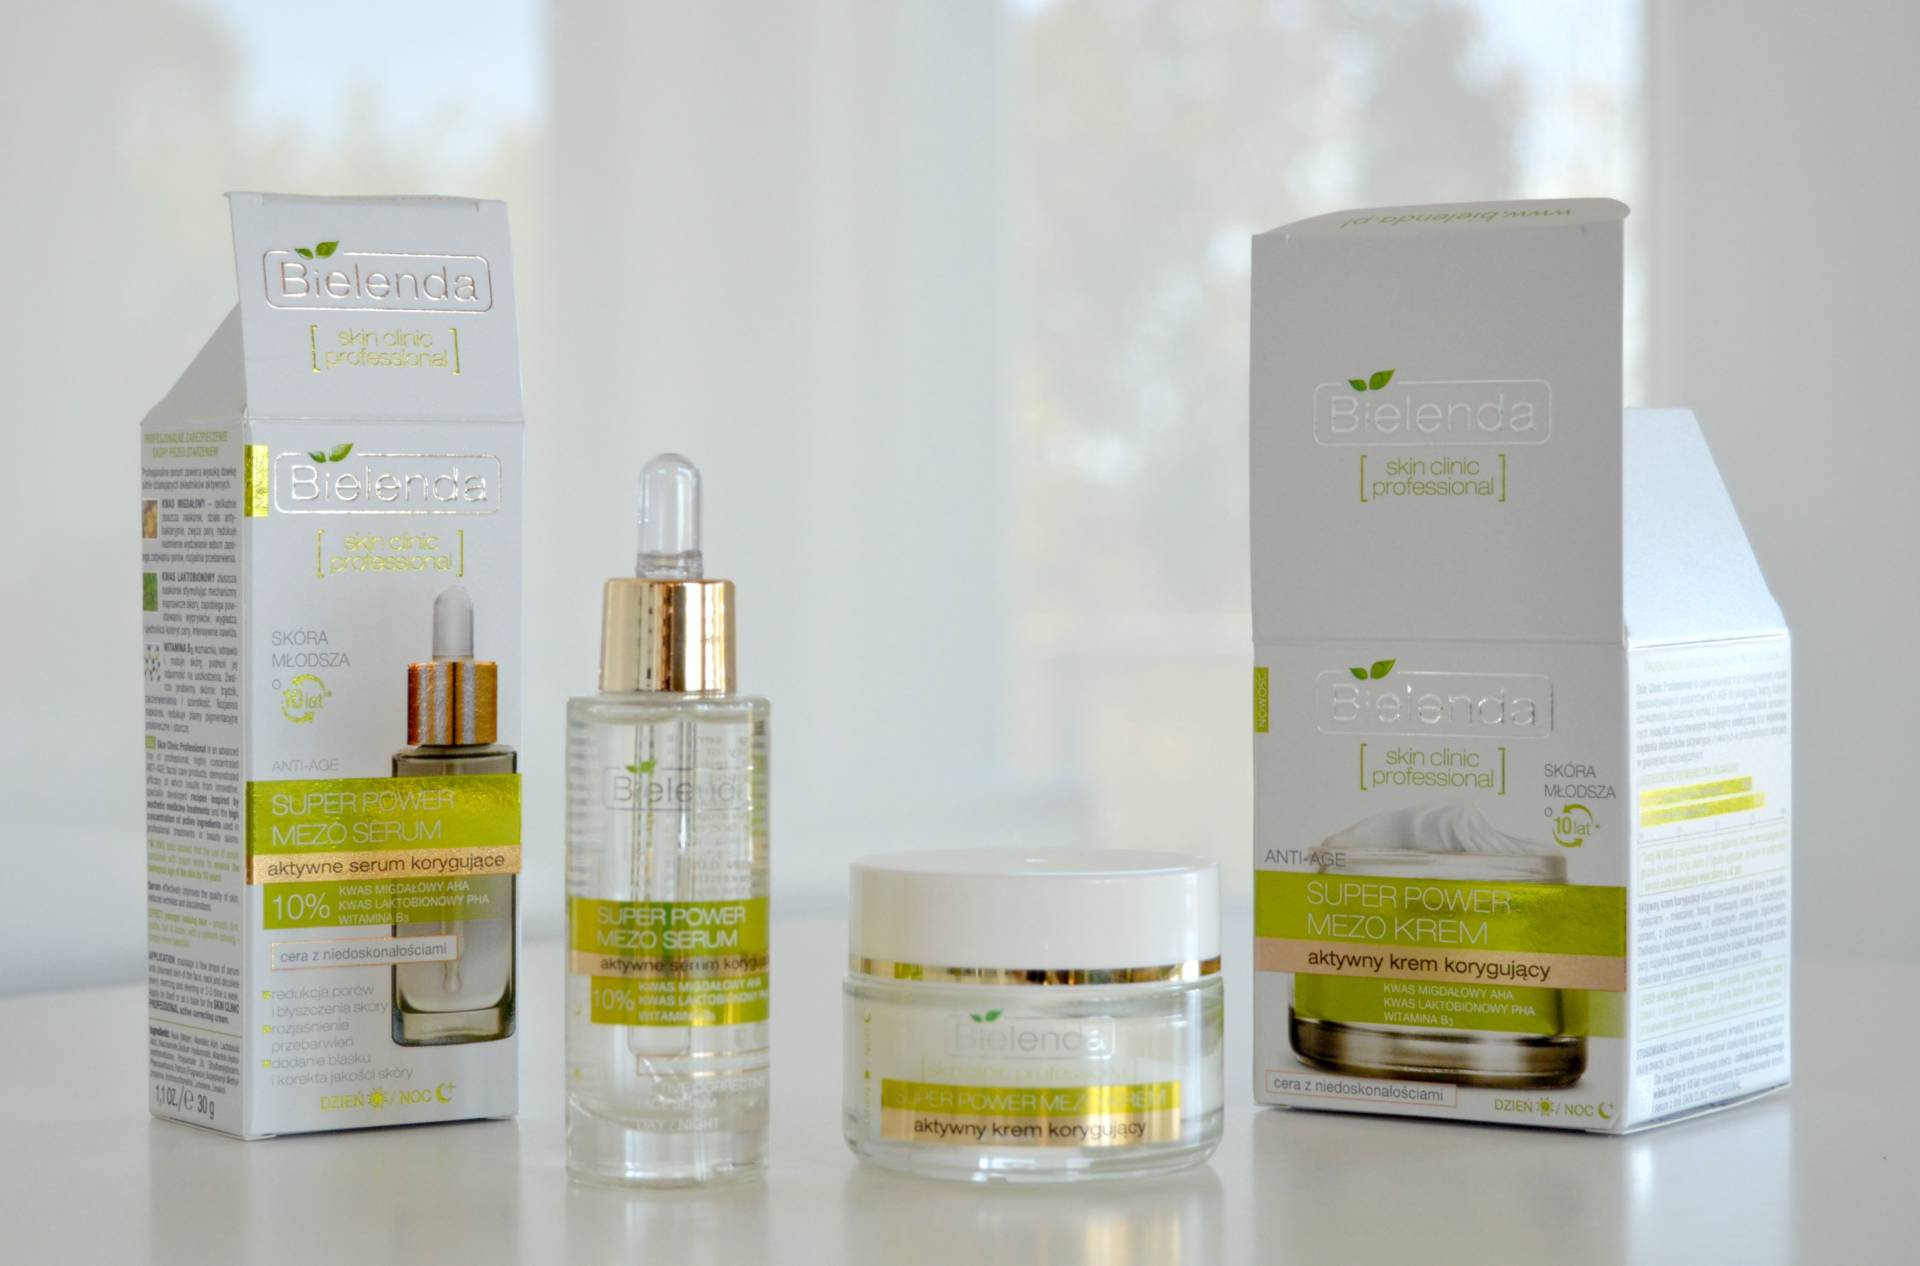 bielenda-mandelic-acid-serum-cream-poland-shopping-polish-brand-skincare-review-inhautepursuit-travel